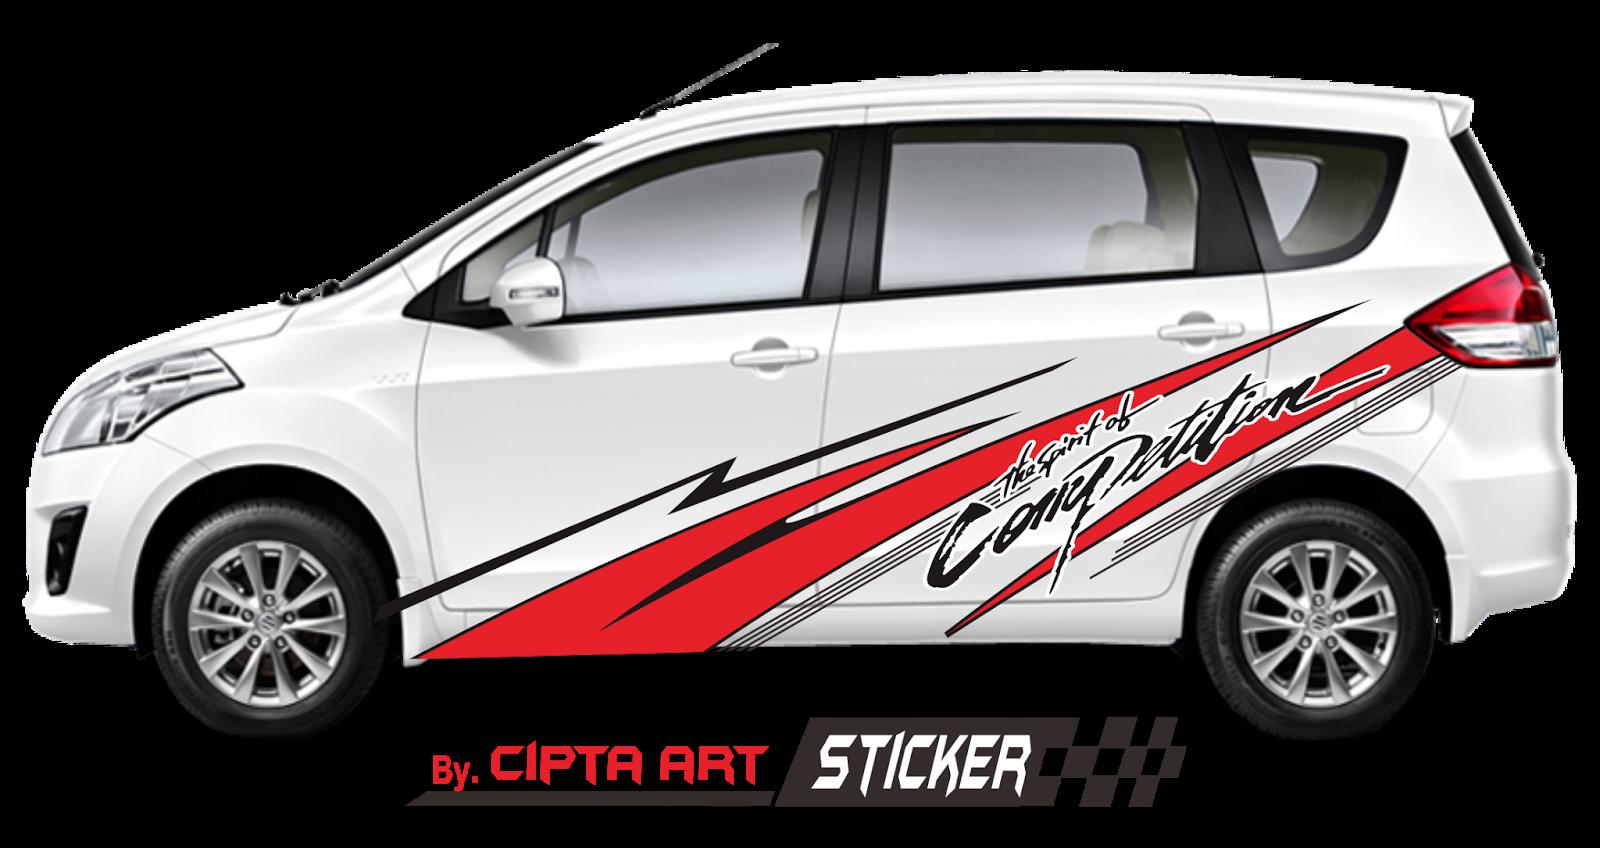 50 Foto Modifikasi Mobil R3 Terbaru  Oneng Motomania